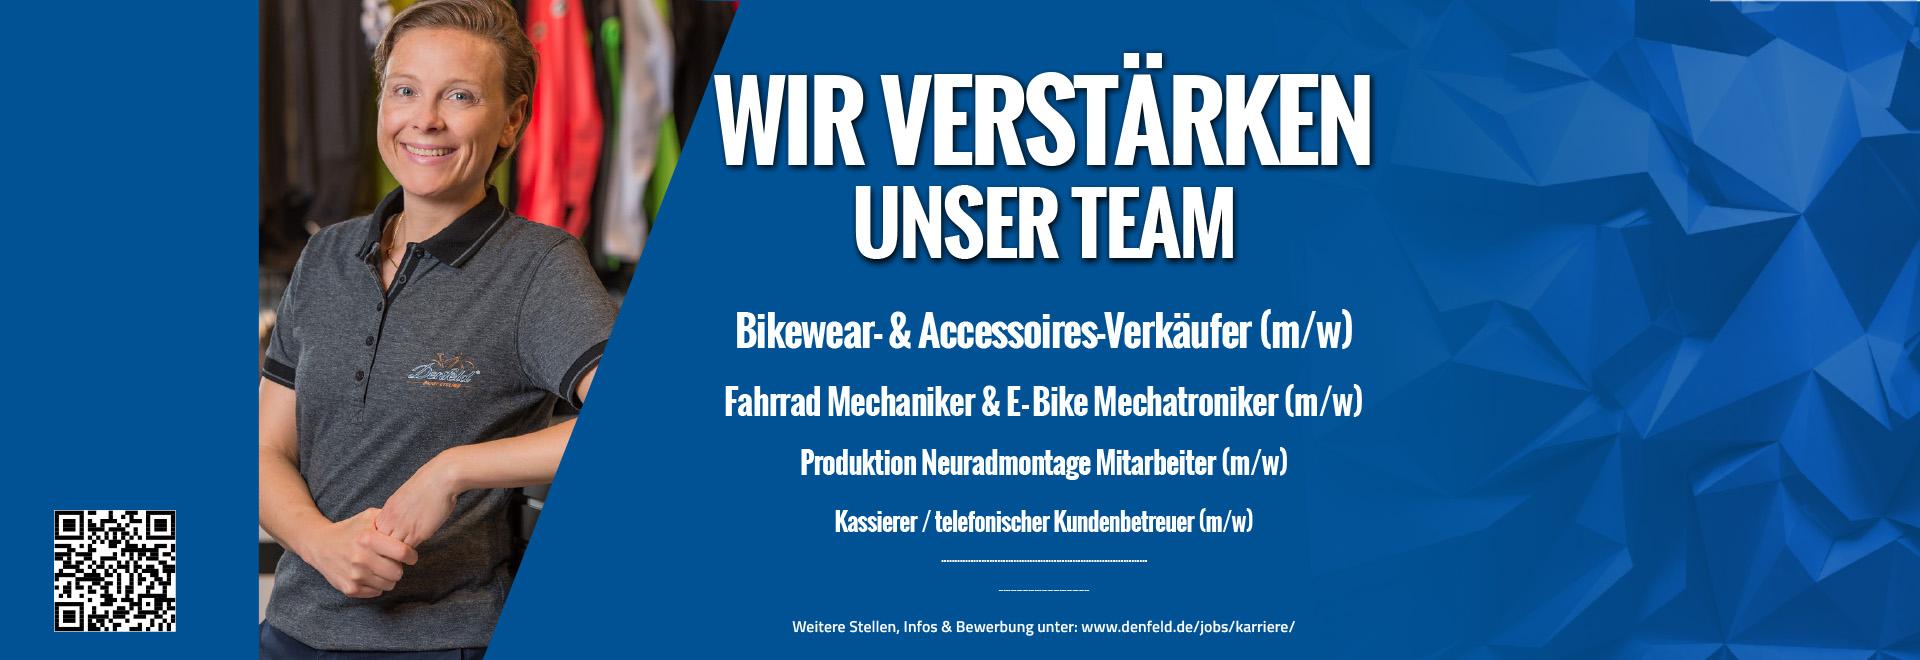 Fahrrad Denfeld Radsport GmbH Stellenangebote